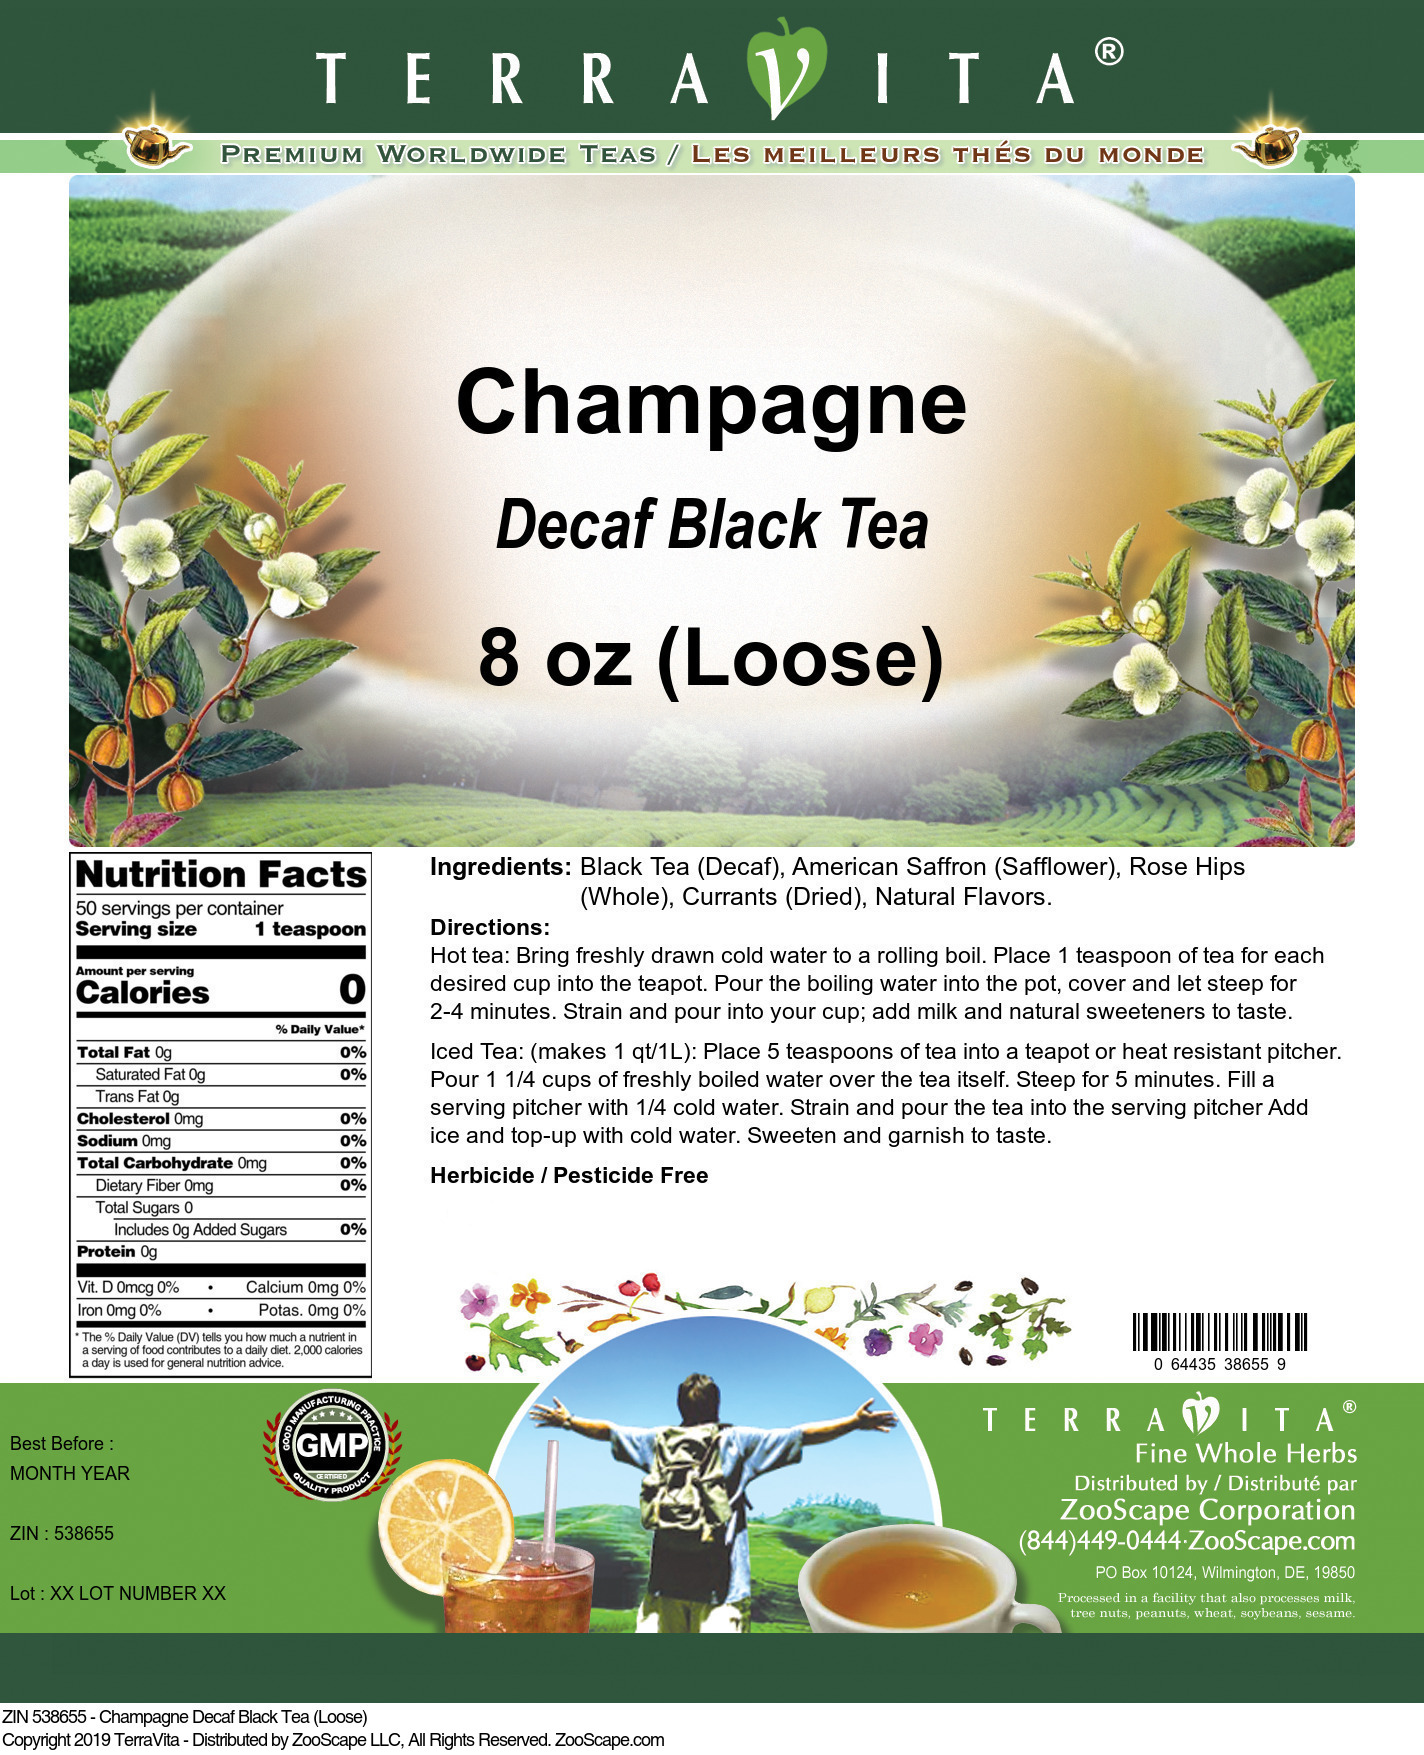 Champagne Decaf Black Tea (Loose)